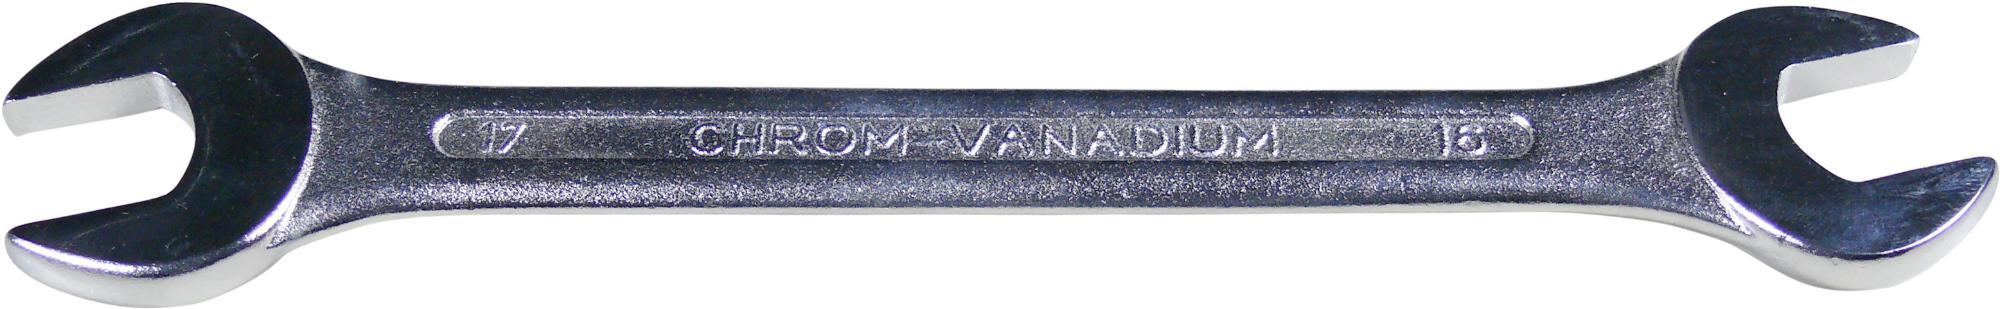 Kľúč vidlica-vidlica, 12x13 mm